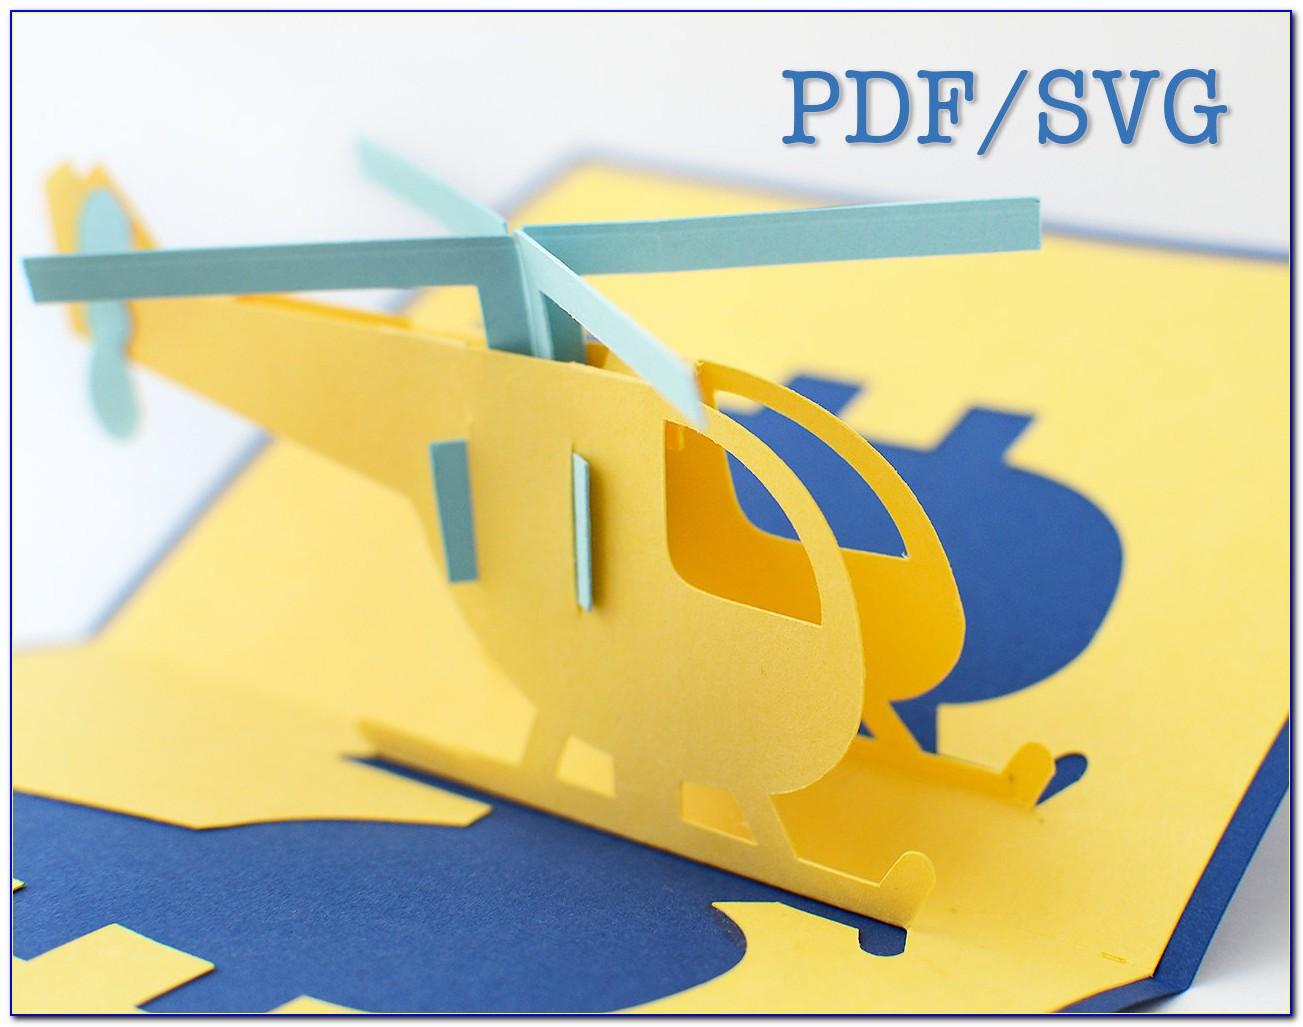 Progressive Insurance Card Template Pdf